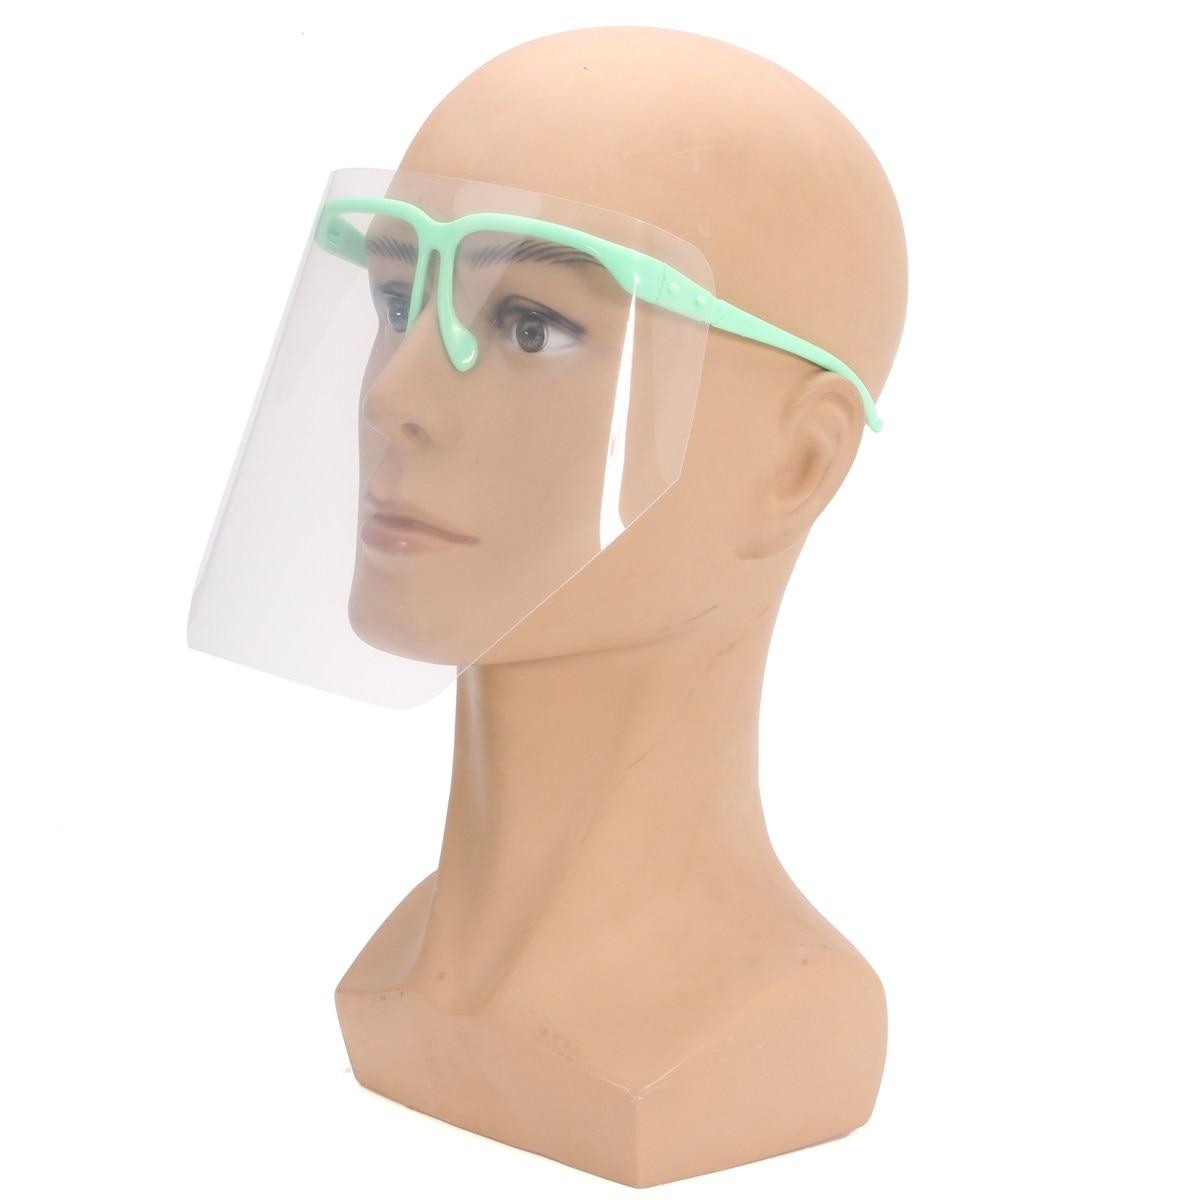 Dental Protective Mask Kit Adjustable Detachable 10 PCS Full Face Shield Visors + 1 Frame Anti-Fog Dustproof Dental Equipment anti fatigue metal full frame shield sunglasses